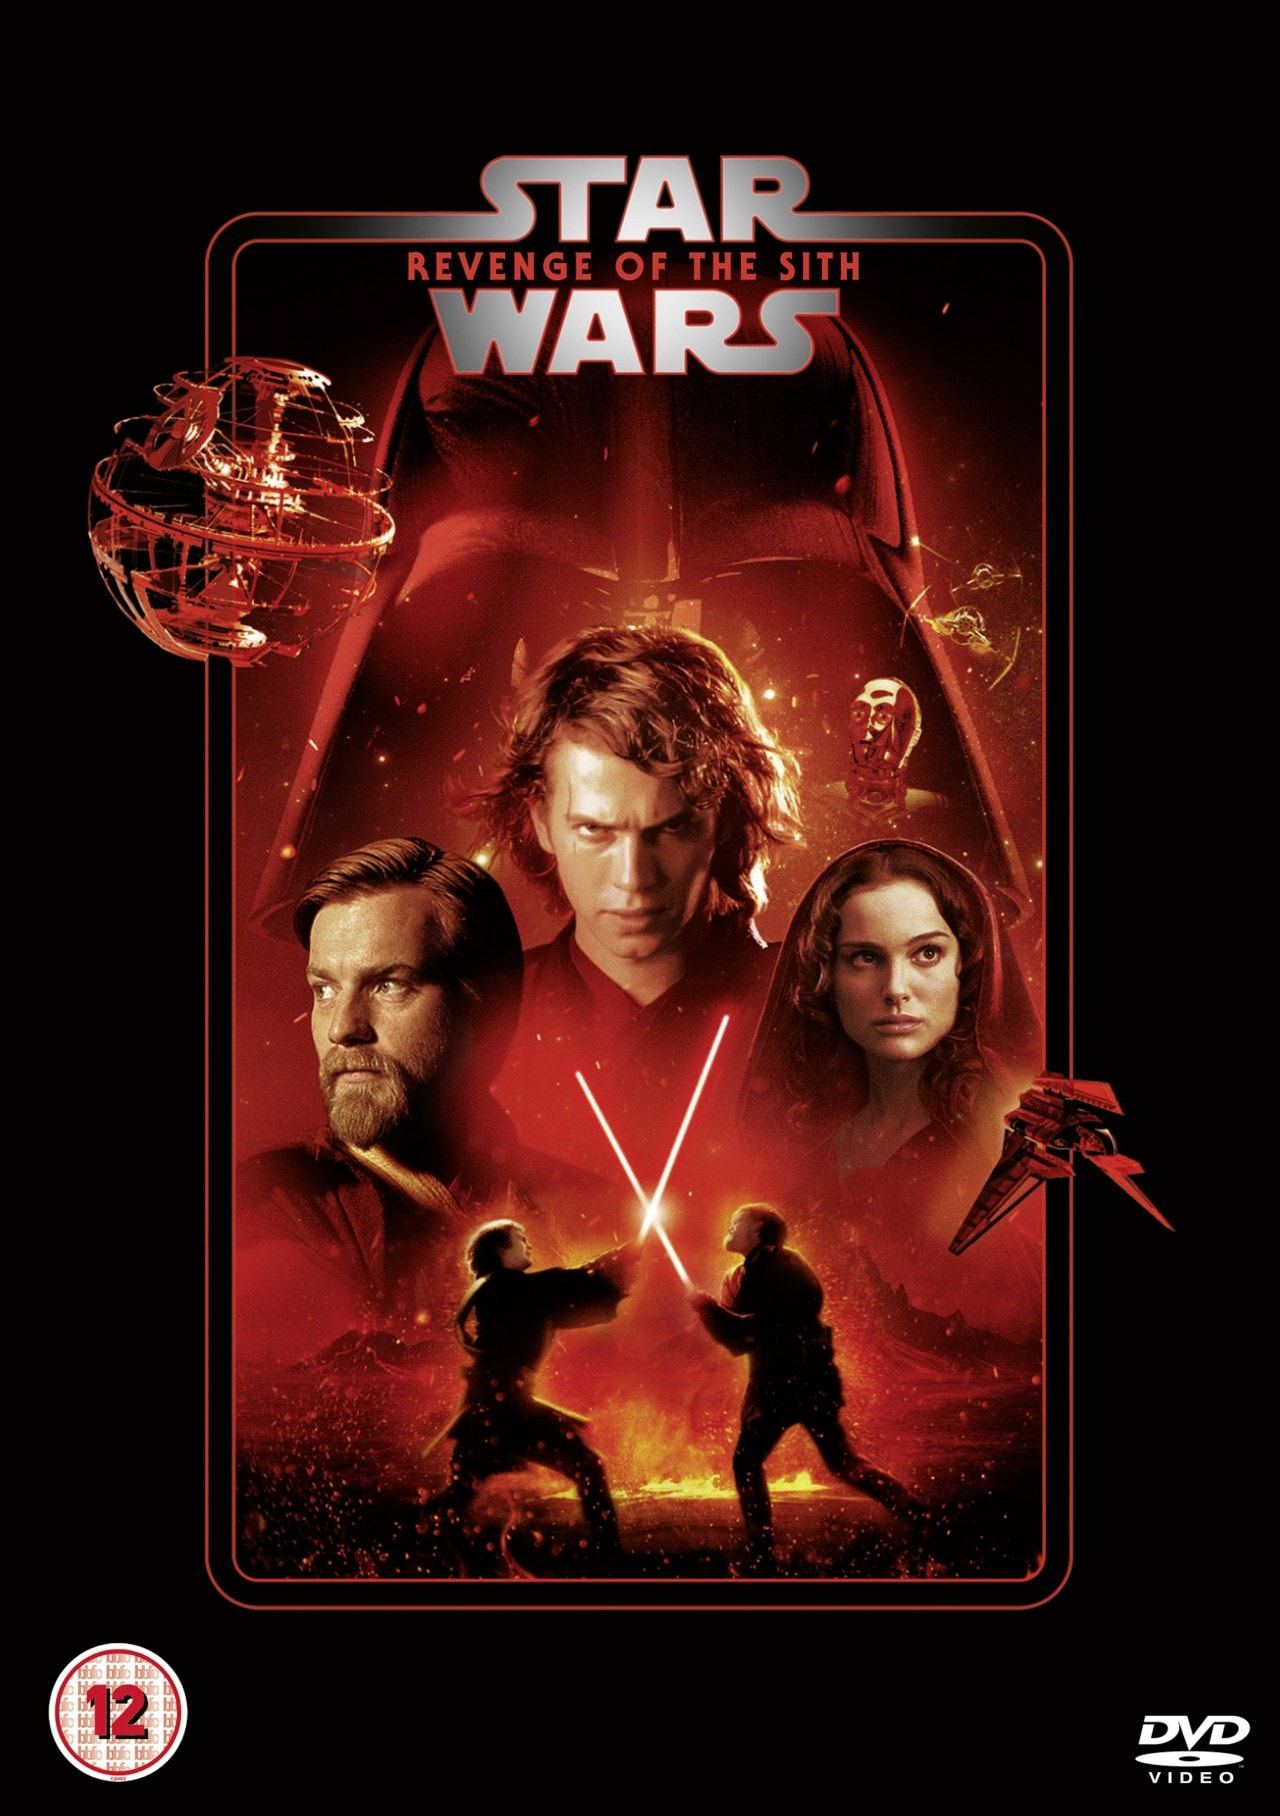 Star Wars: Episode III - Revenge of the Sith - 1